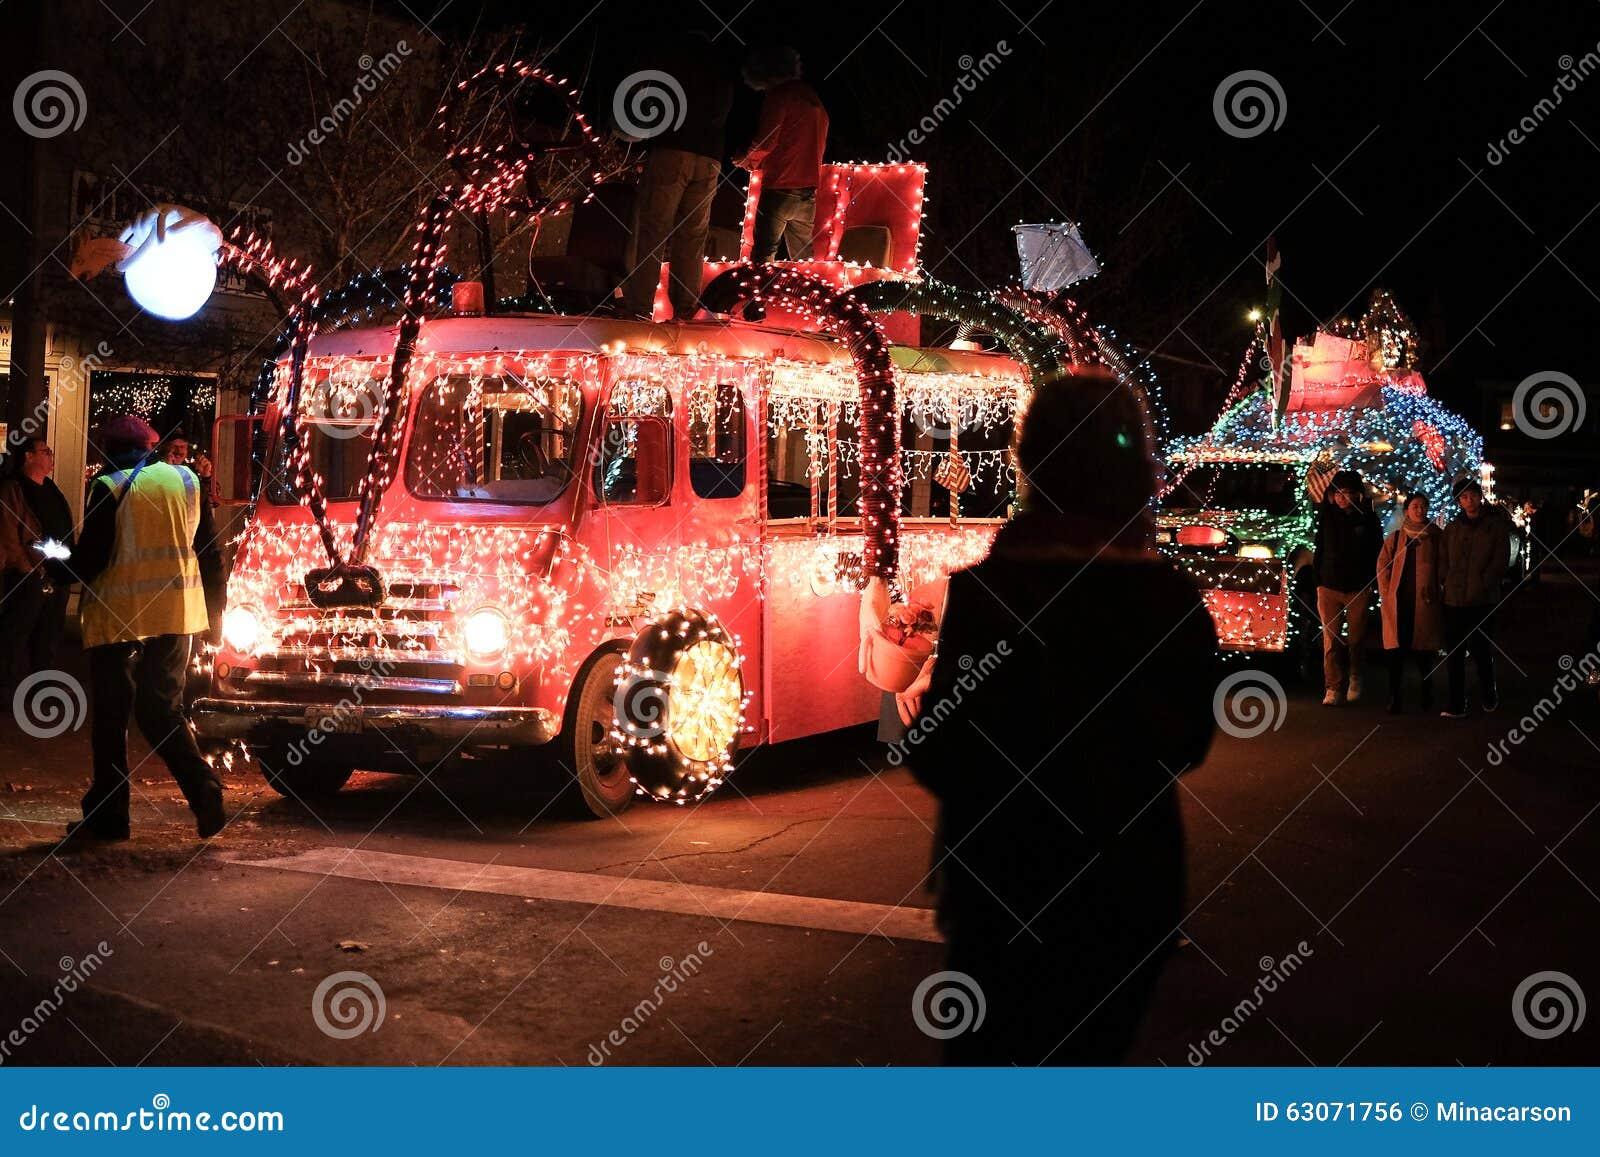 Antique Seuss Themed Milk Truck Prepares For Holiday Parade